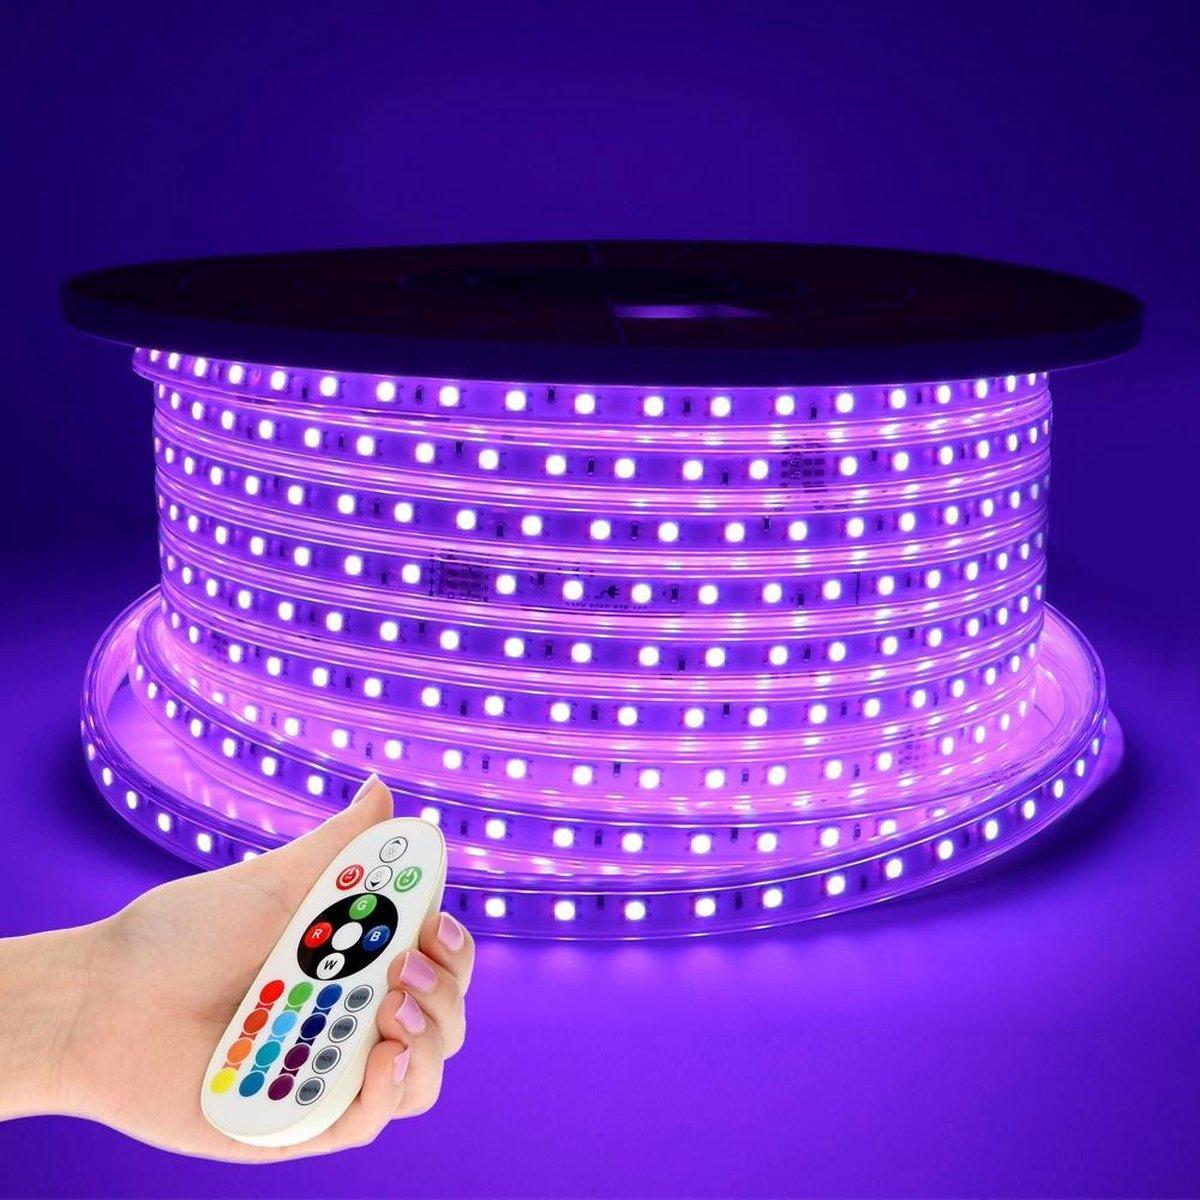 Dimbare LED Strip 50m RGB 60 LEDs/m IP65 Plug & Play - Flex60 Series